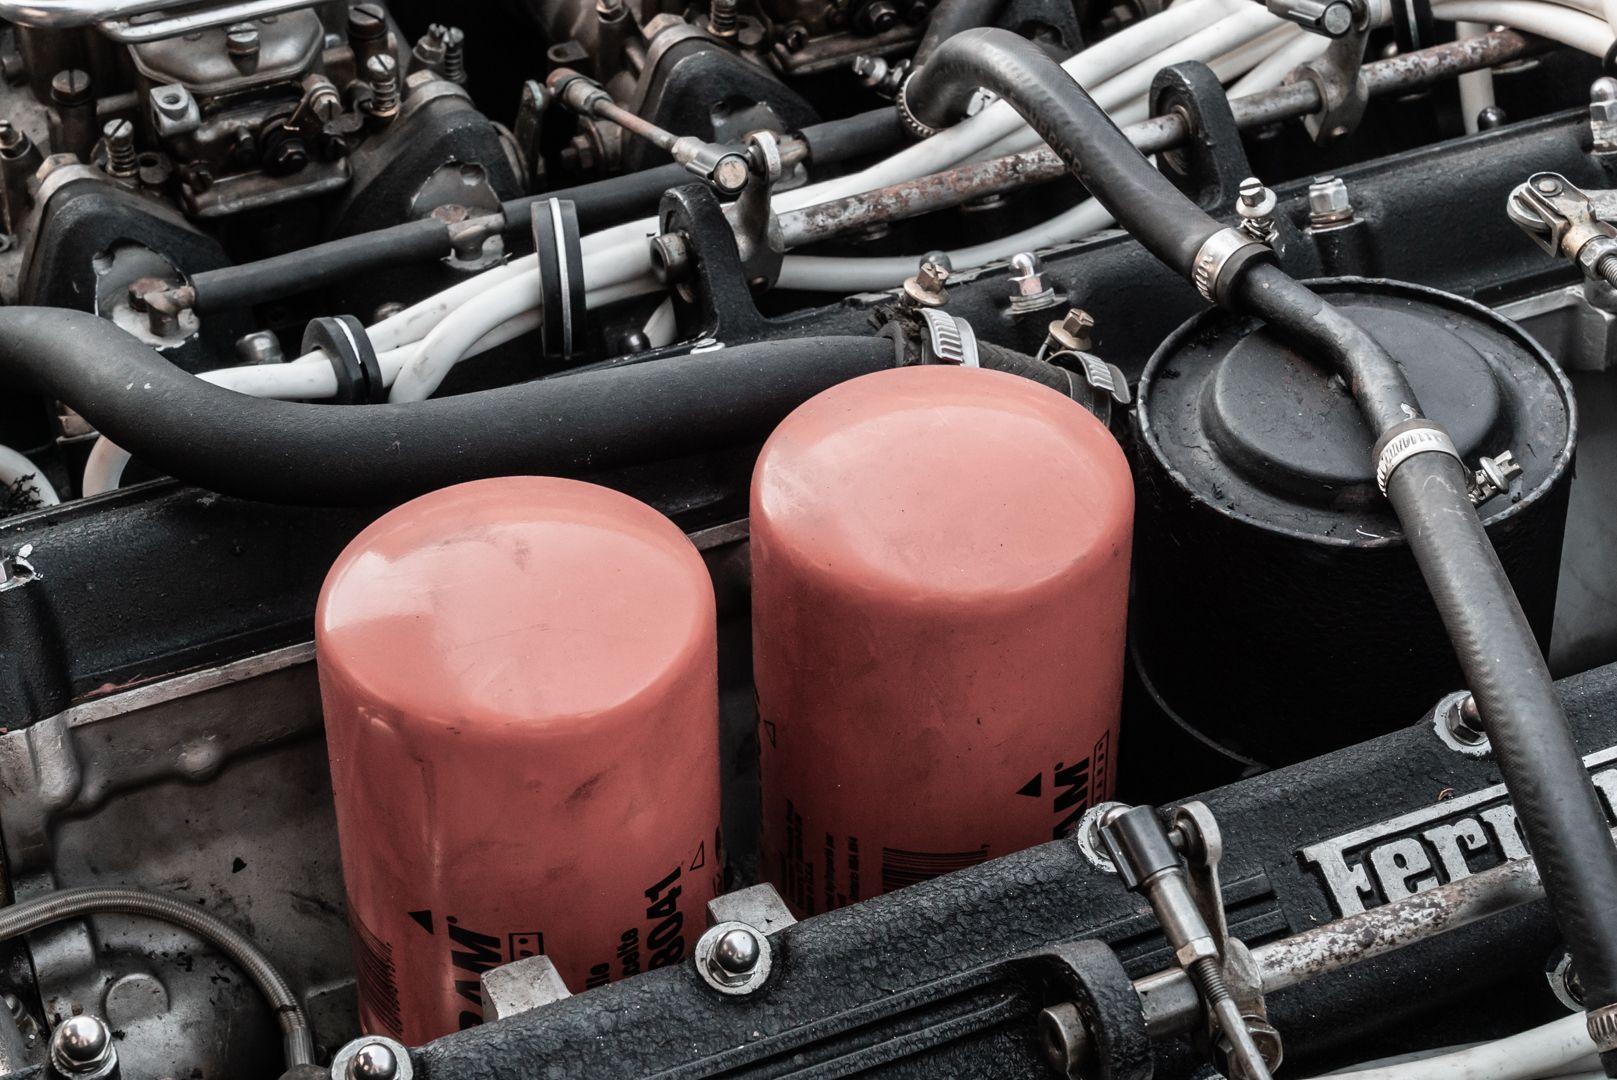 1973 Ferrari 365 GT4 2+2 66425